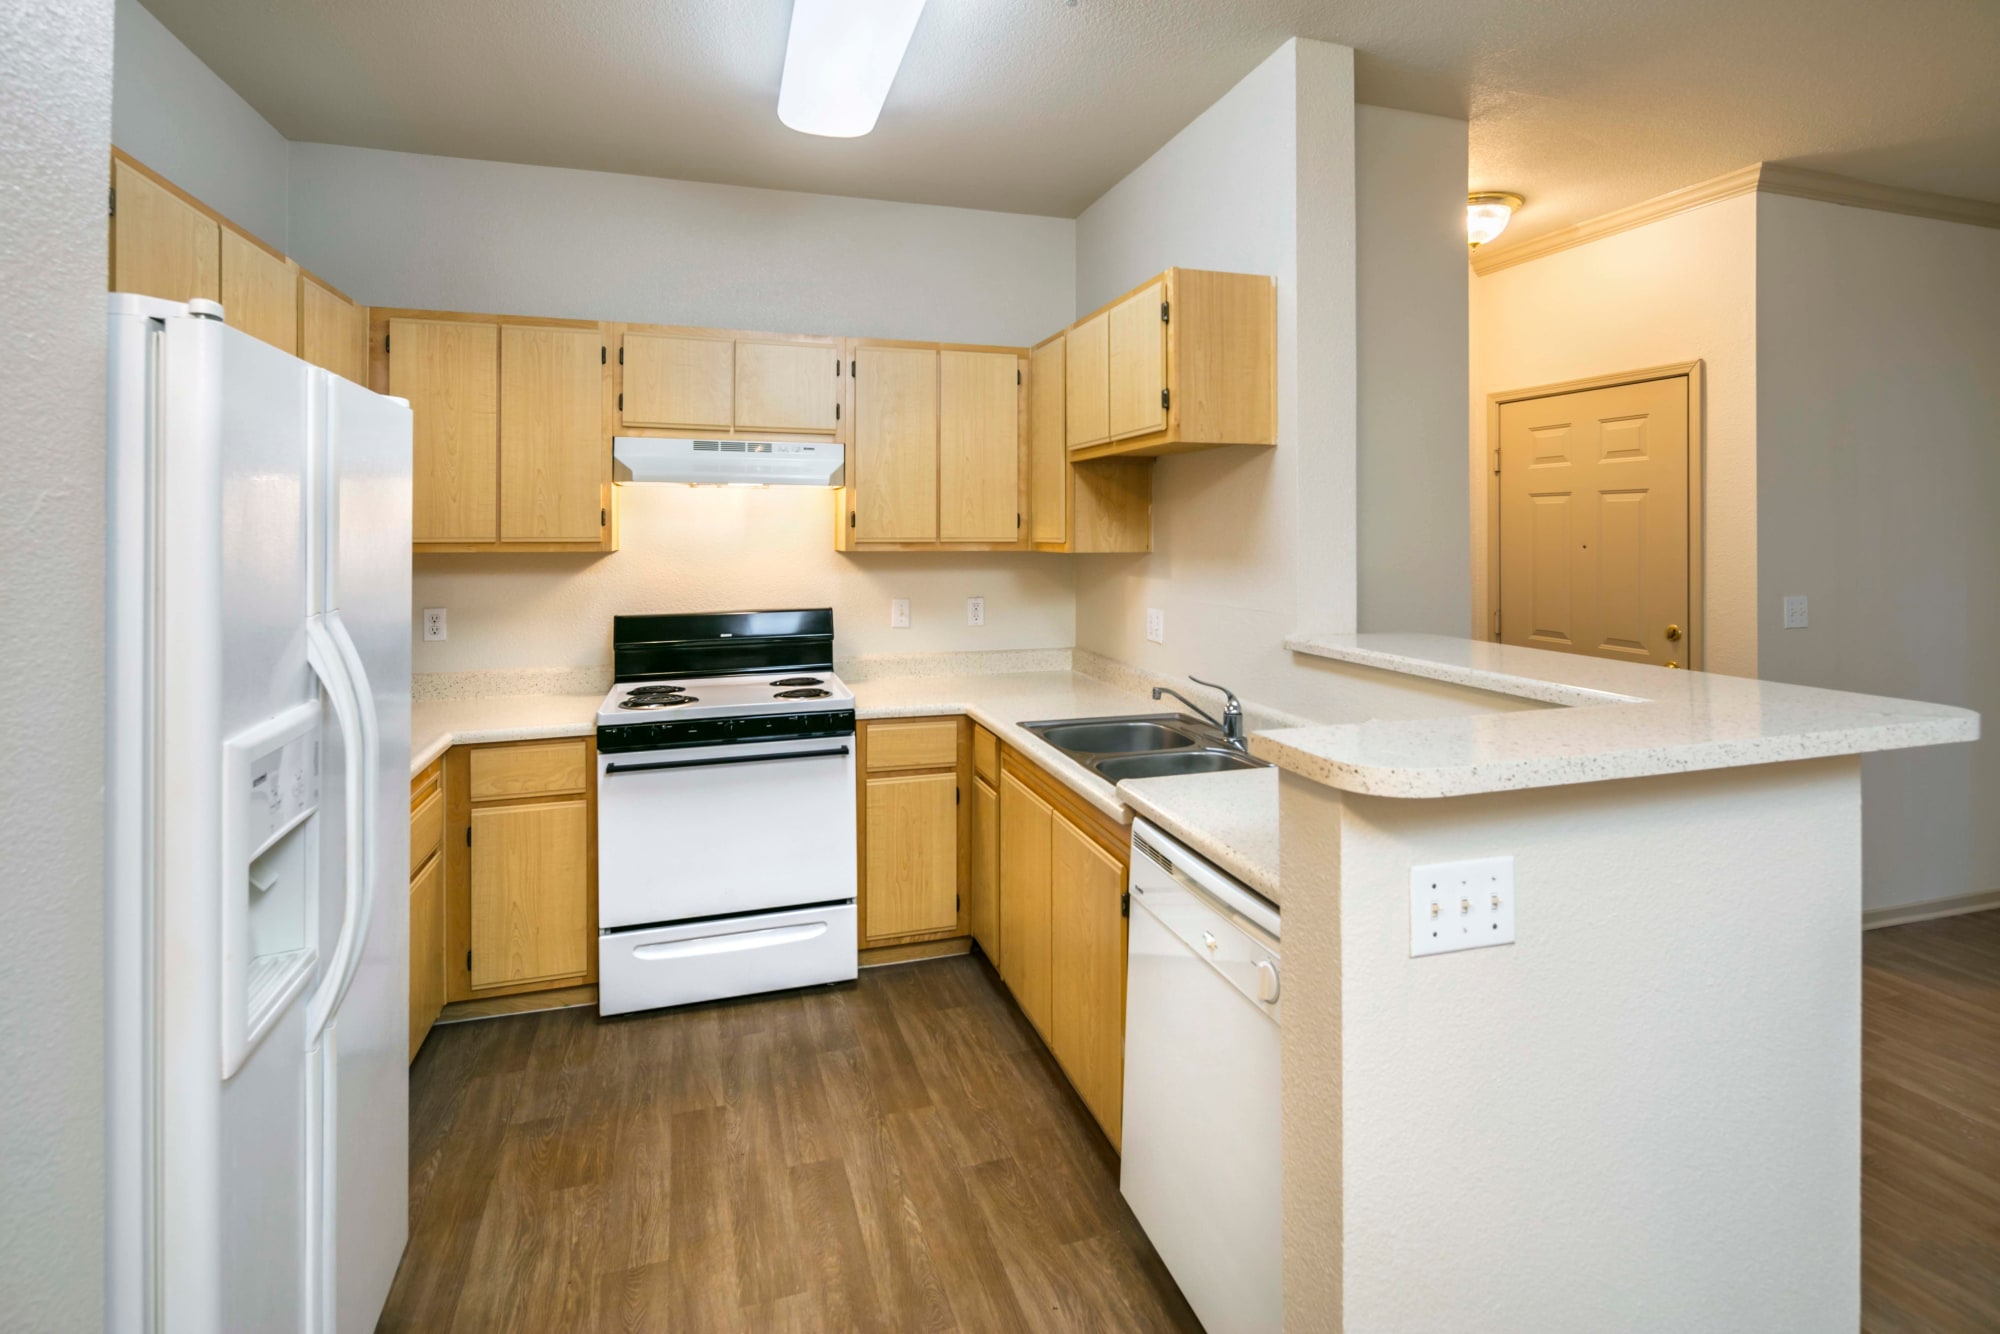 A kitchen layout at Natomas Park Apartments in Sacramento, California